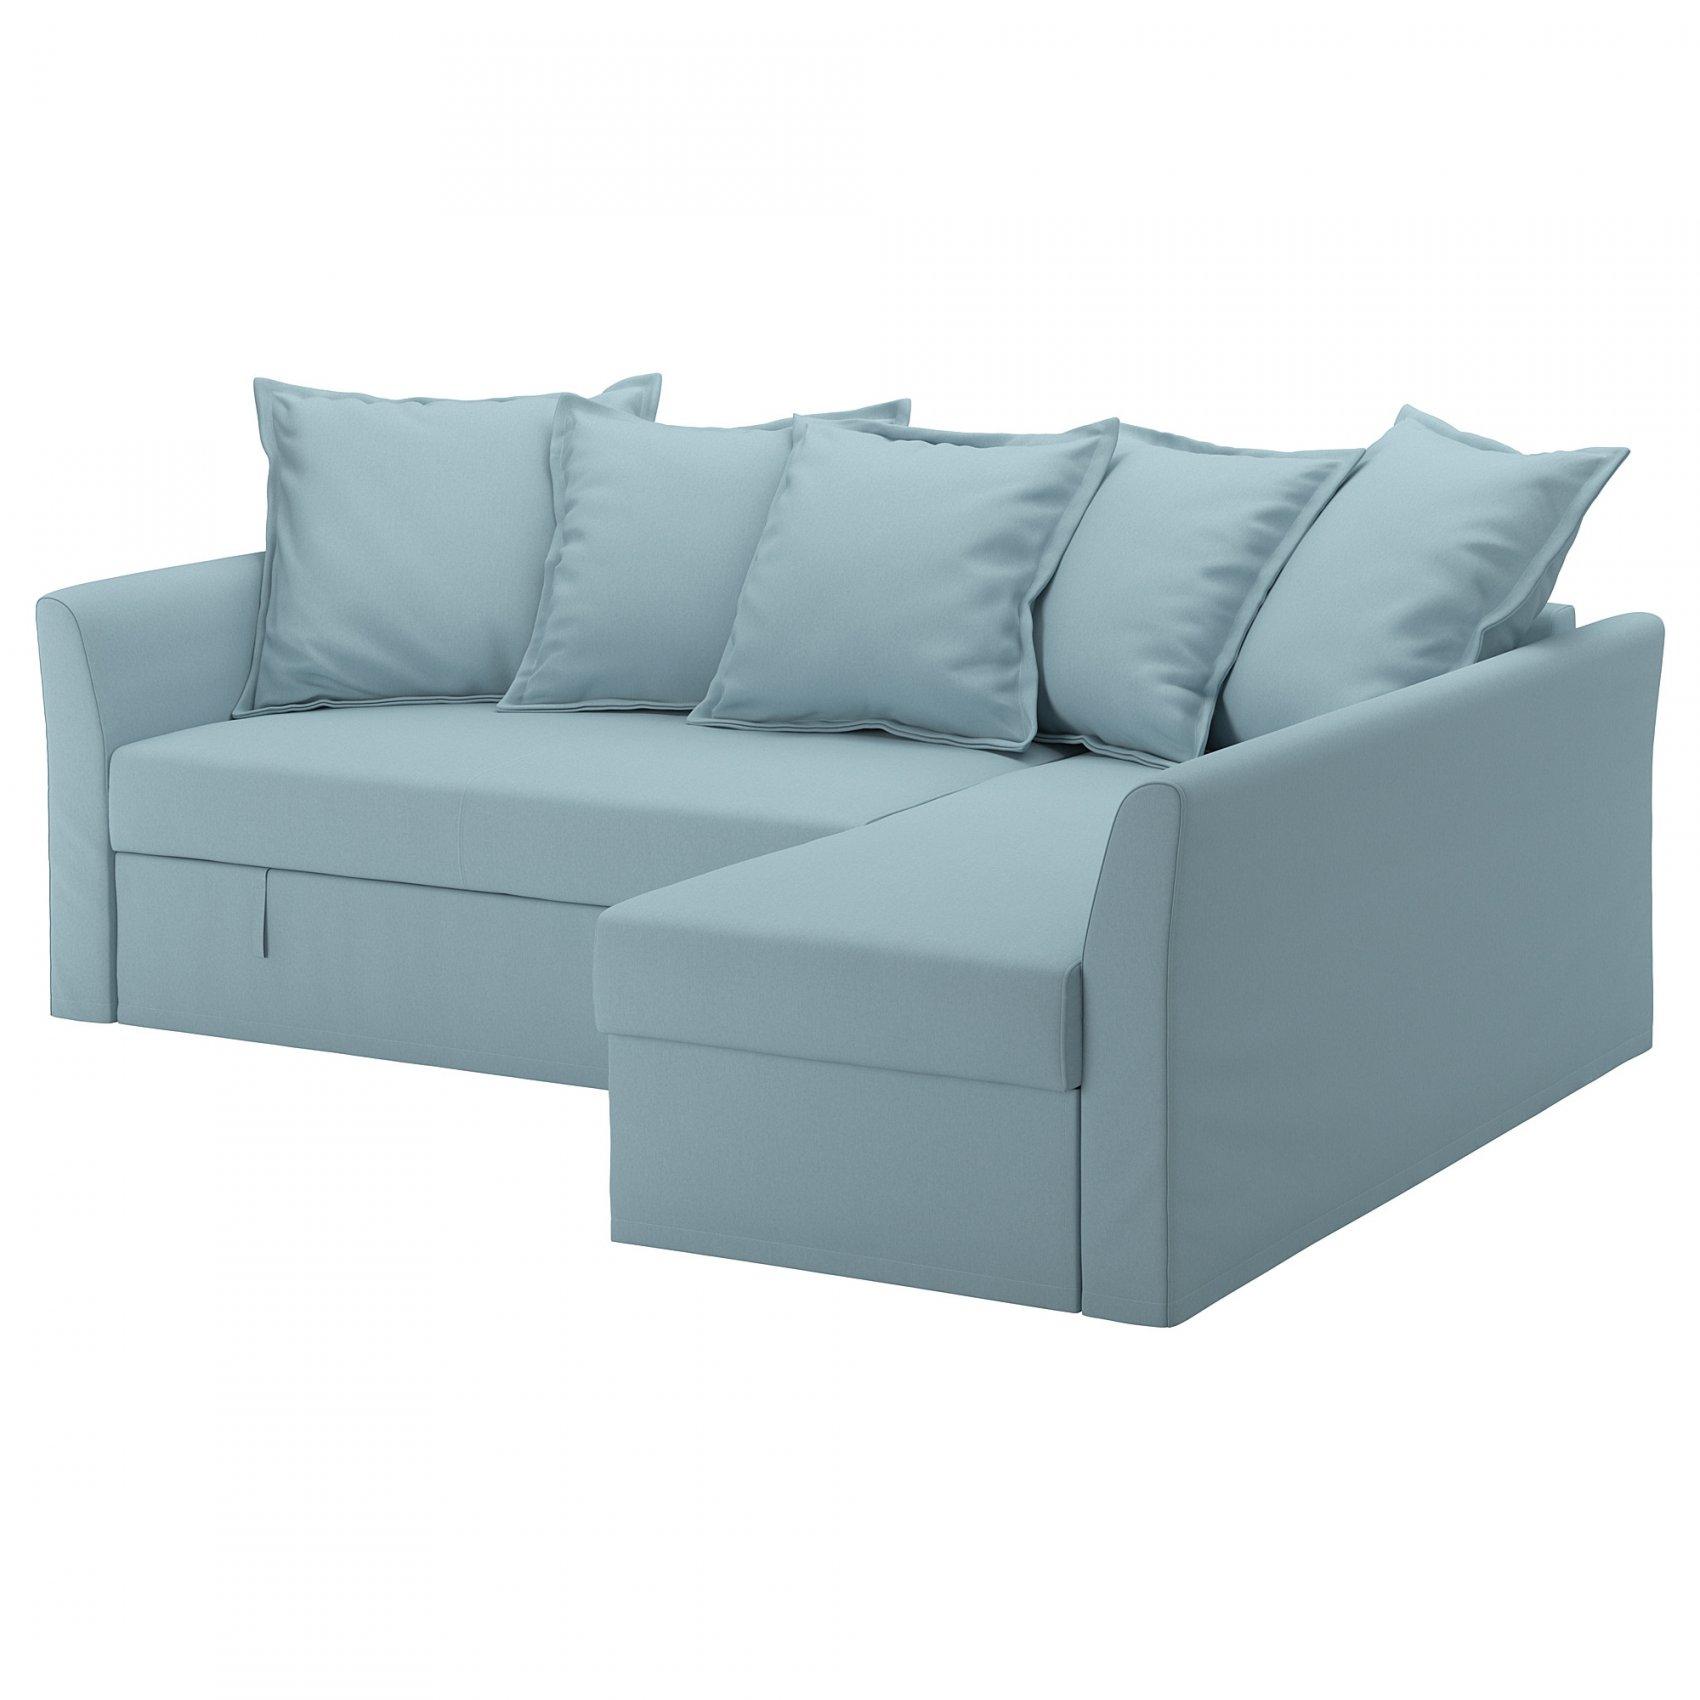 Fauteuilscanapés Convertibles Confortable & Pas Cher Ikea